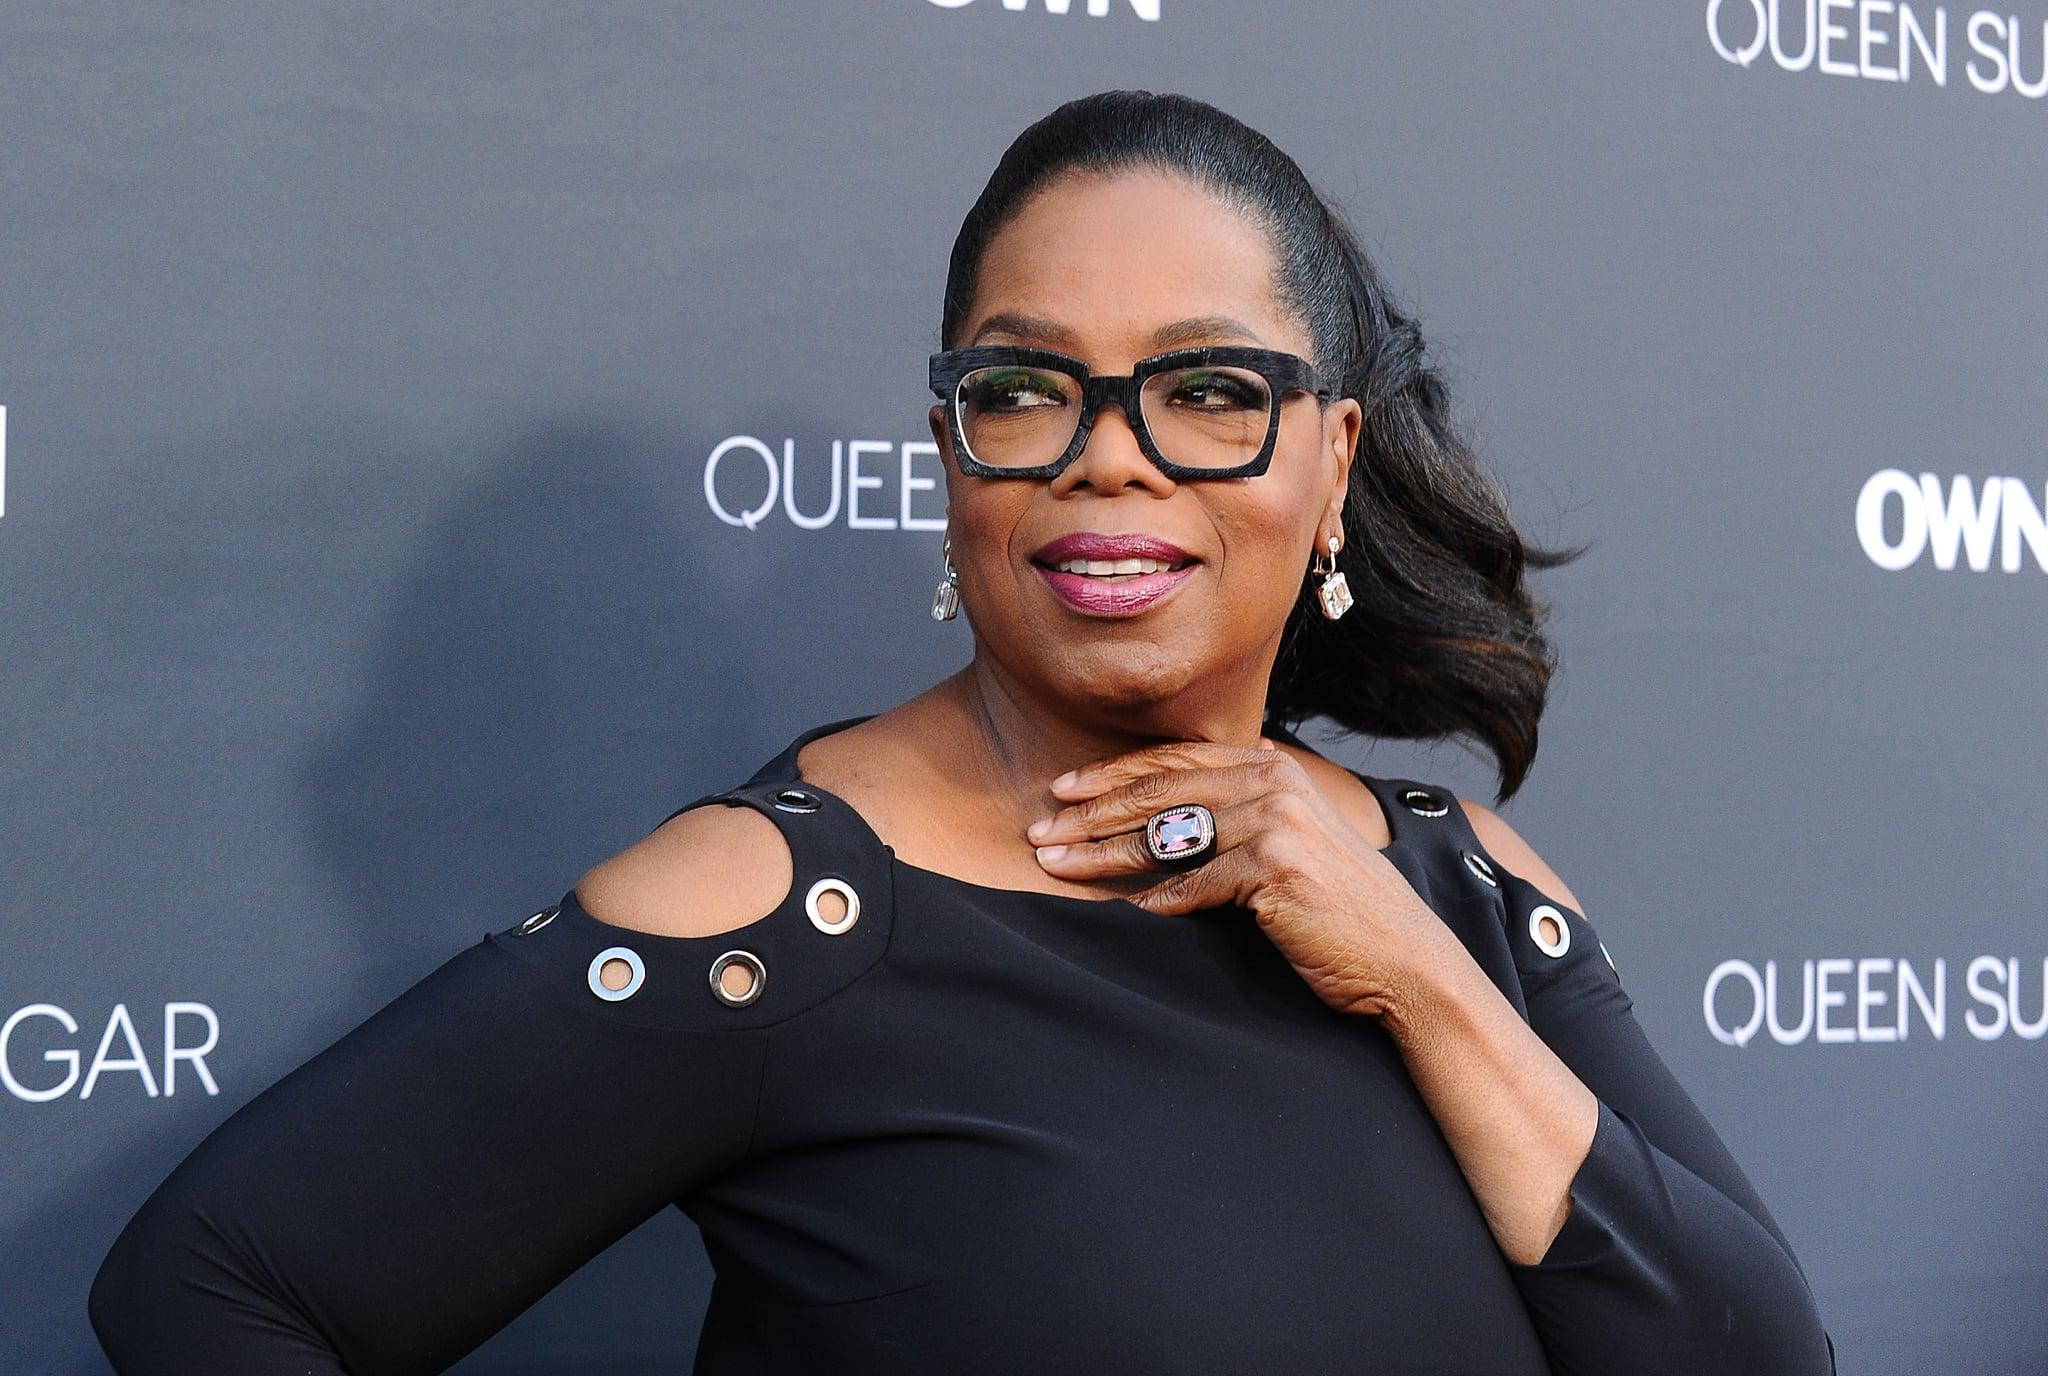 BURBANK, CA - AUGUST 29:  Oprah Winfrey attends the premiere of